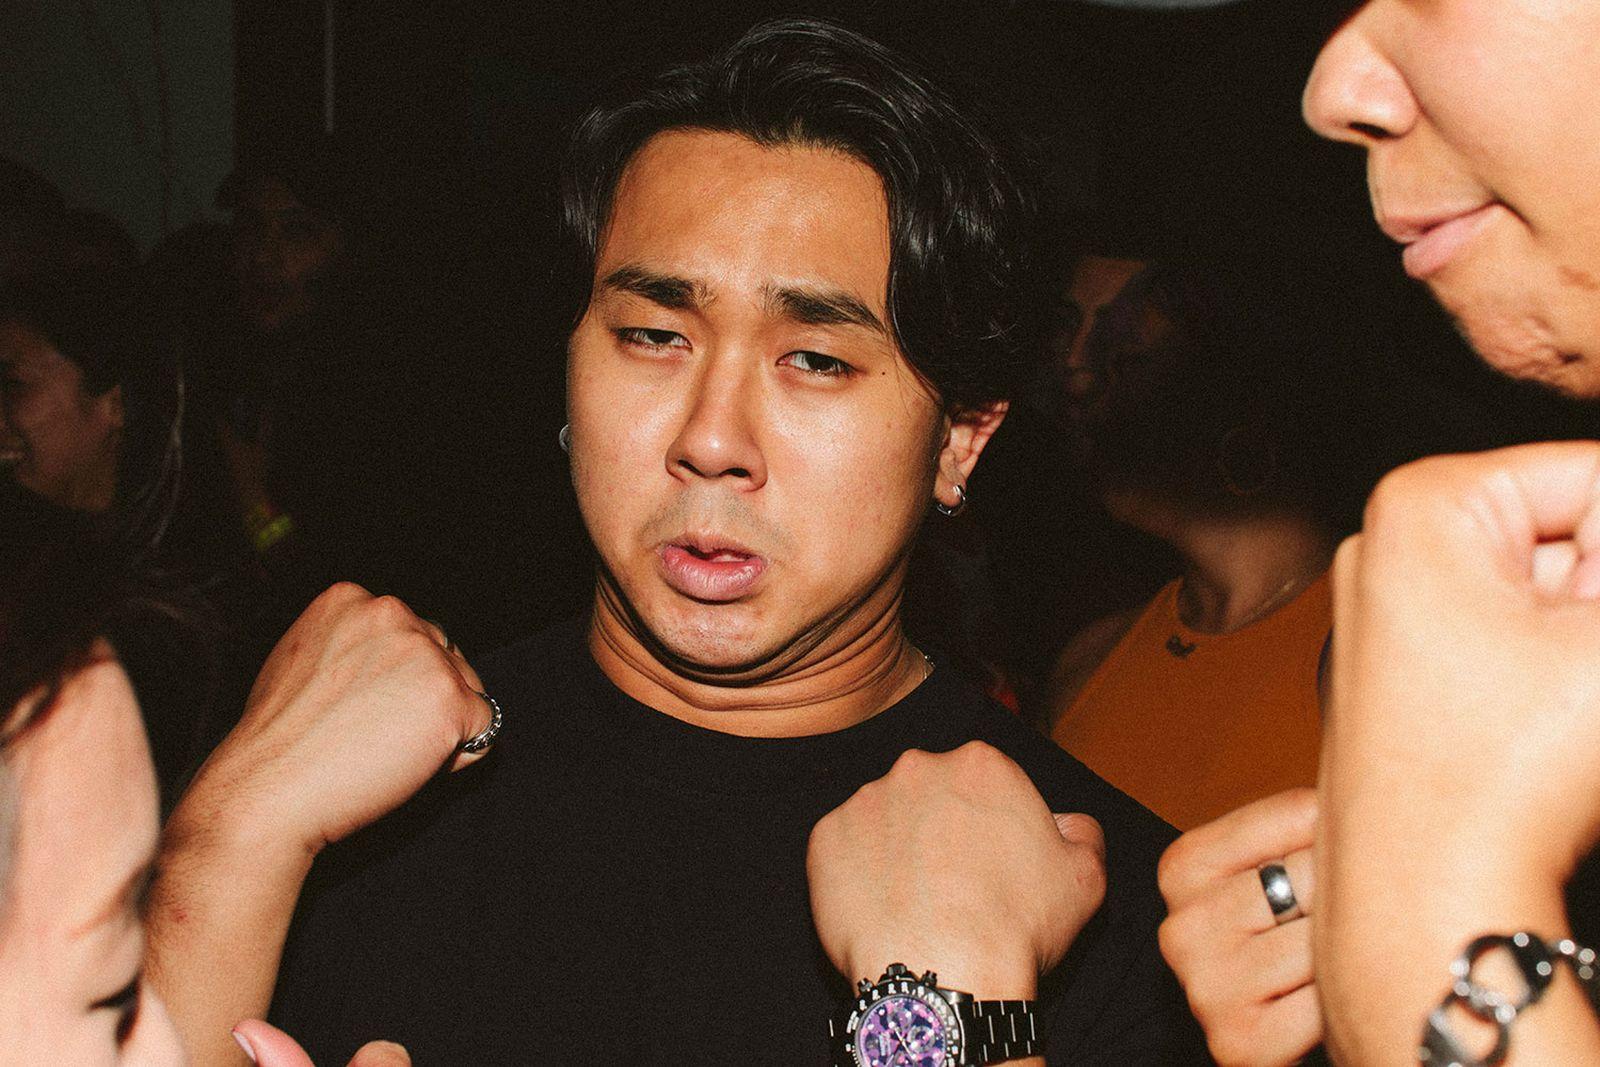 chief keif highsnobiety FTP DC mag party Fredo Santana chief keef